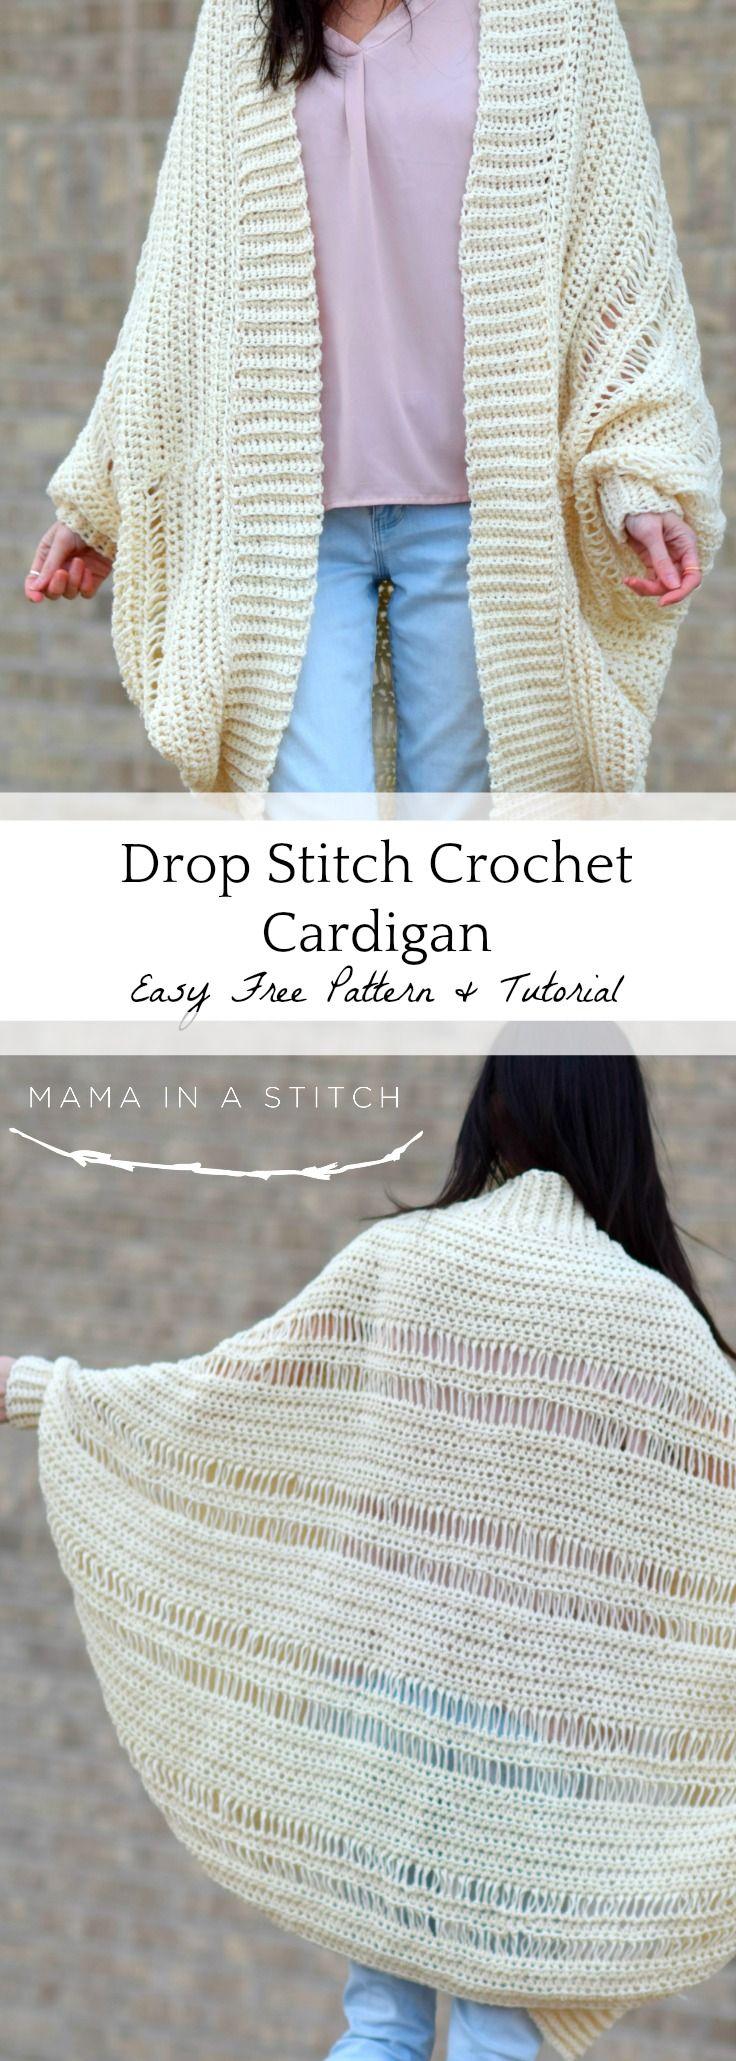 Pretty Drop Stitch Cardigan Beginner Crochet Sweater   Crochet ...